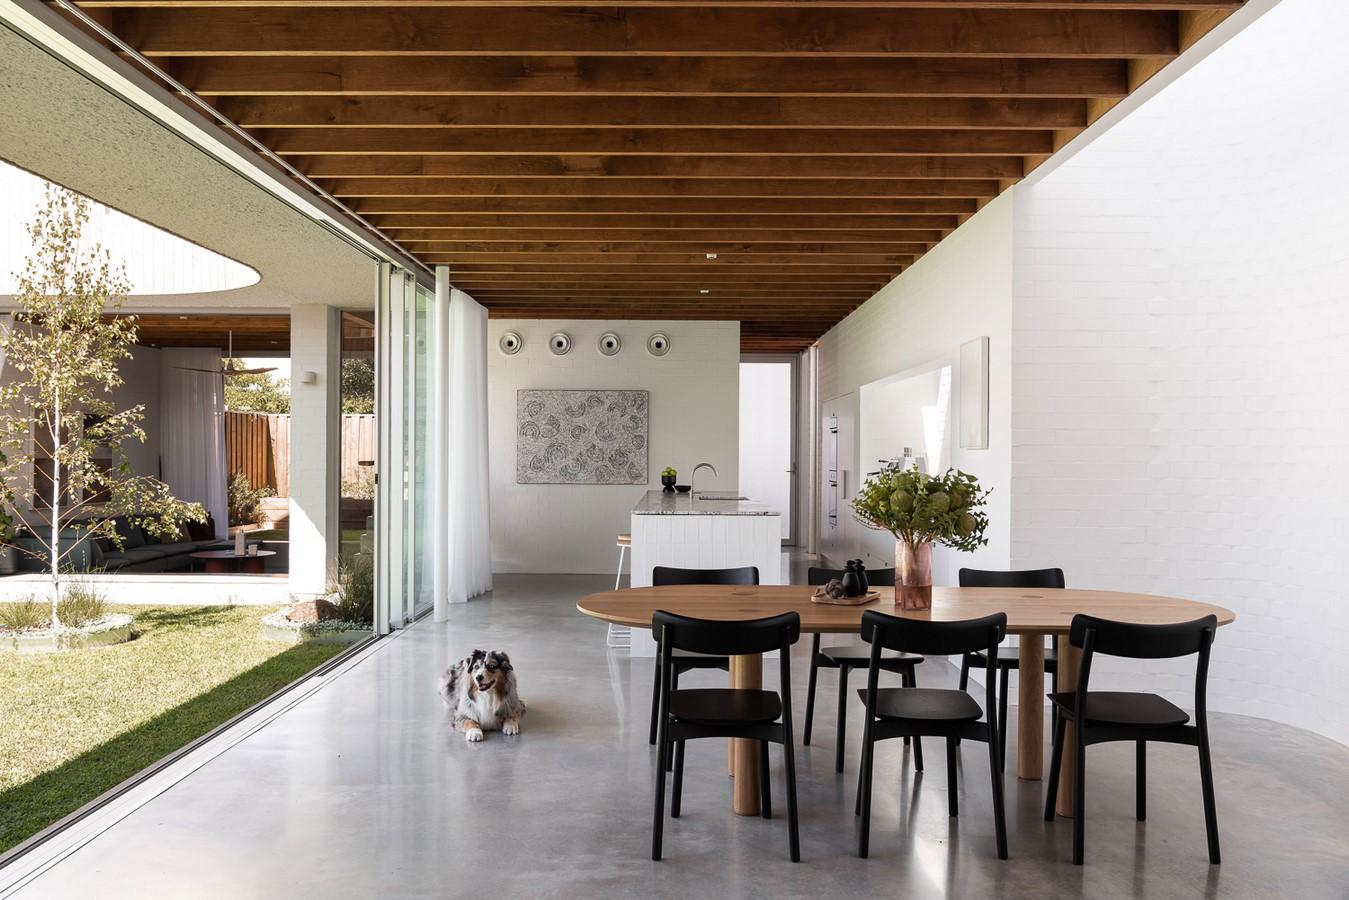 East Fremantle House by NIC BRUNSDON - Sheet2